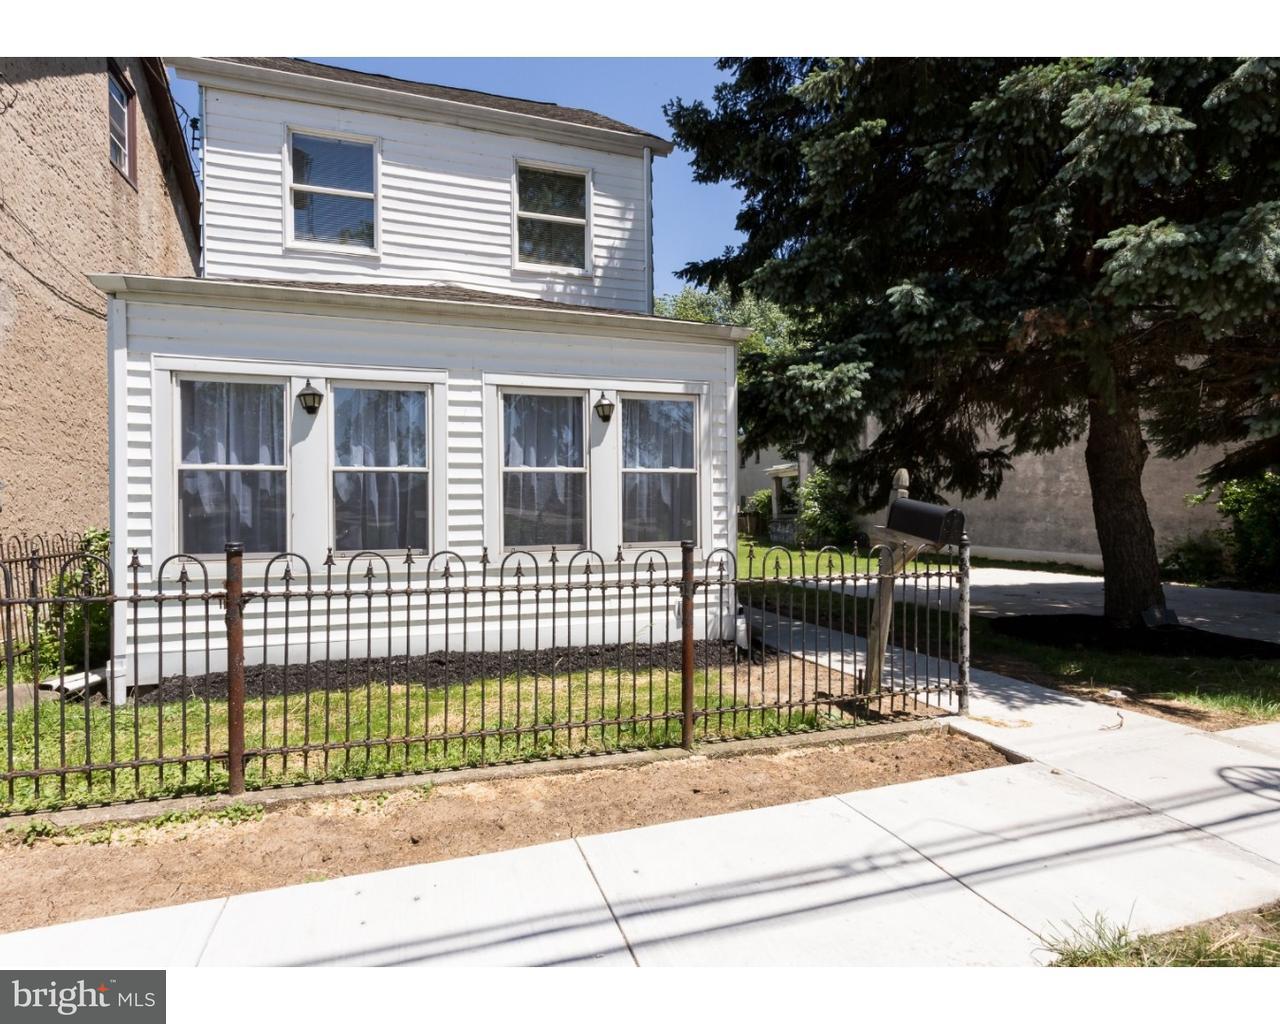 Single Family Home for Sale at 627 OLD ELM Street Conshohocken, Pennsylvania 19428 United States